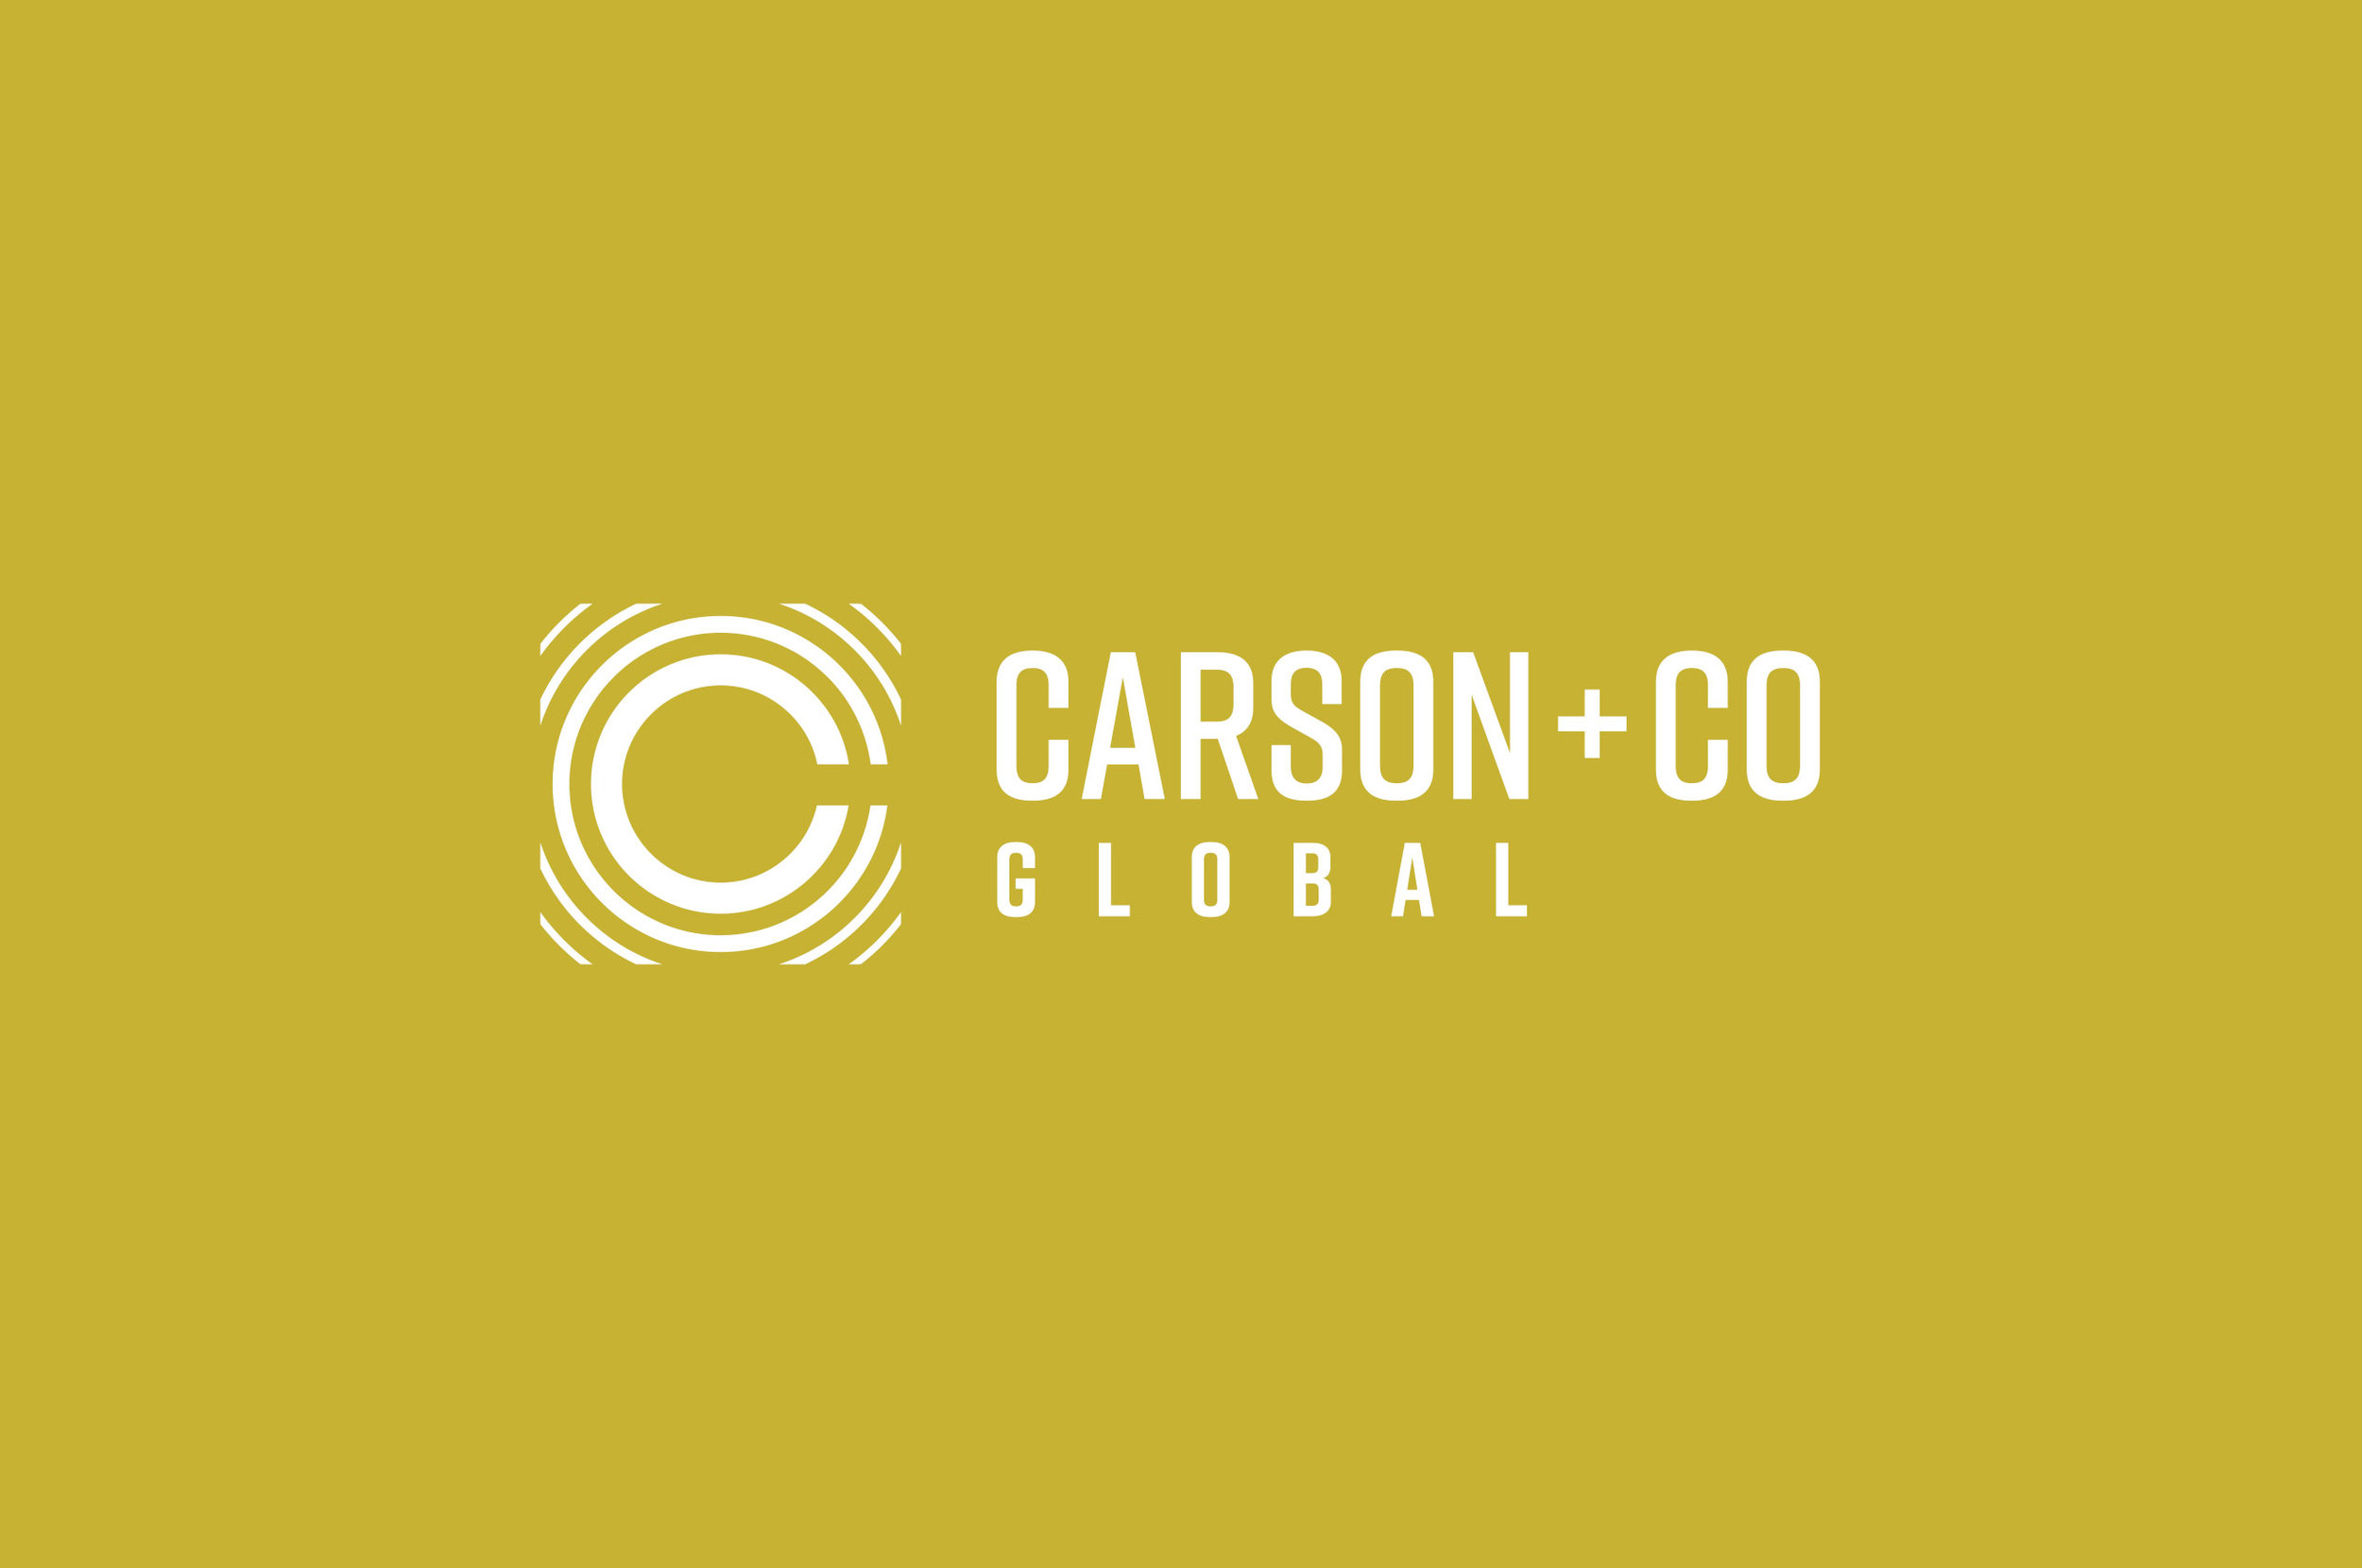 CCG_logo_1.jpg